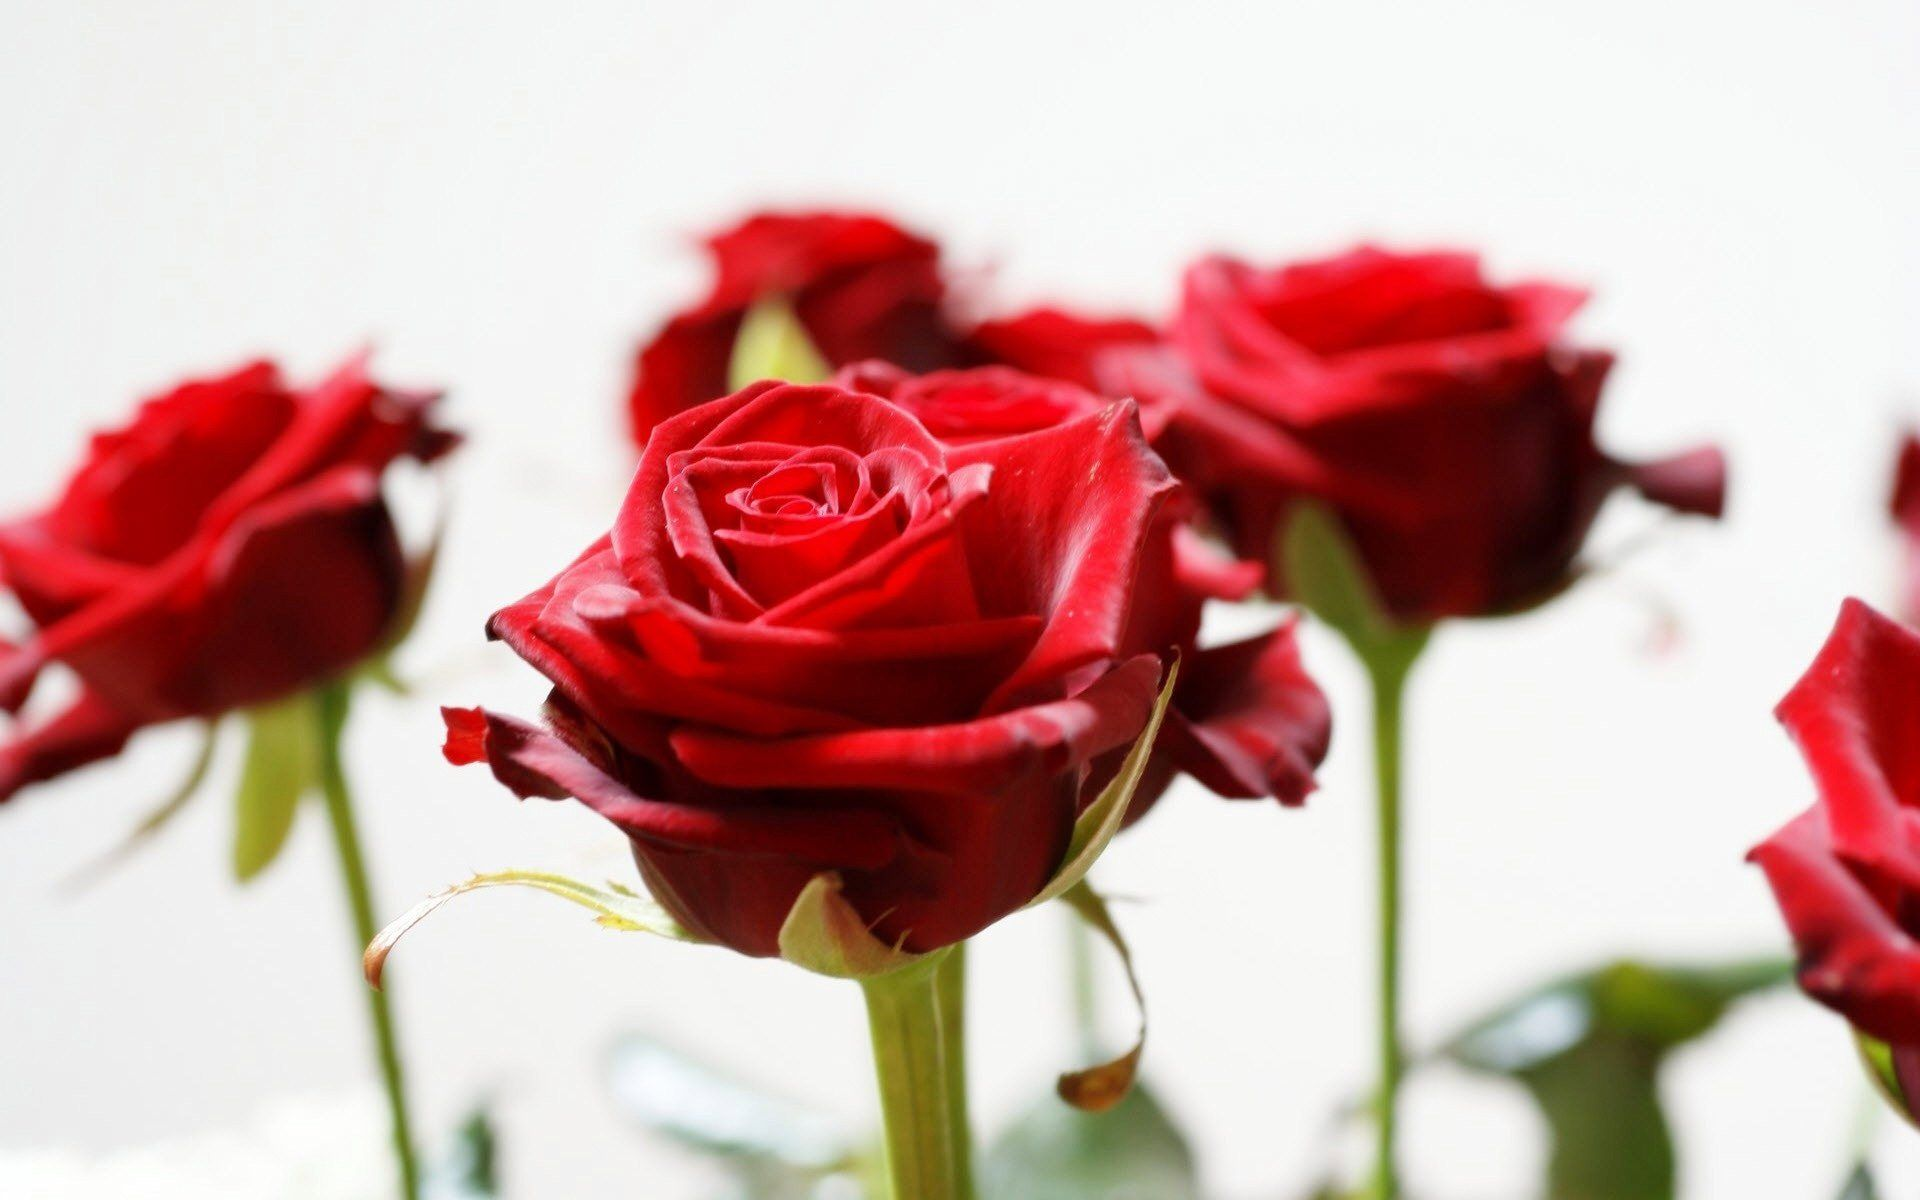 Http Www Tokobungadijakartapusat Com Hadiah Valentine Untuk Cowo Atau Laki Laki Bunga Mawar Merah Mawar